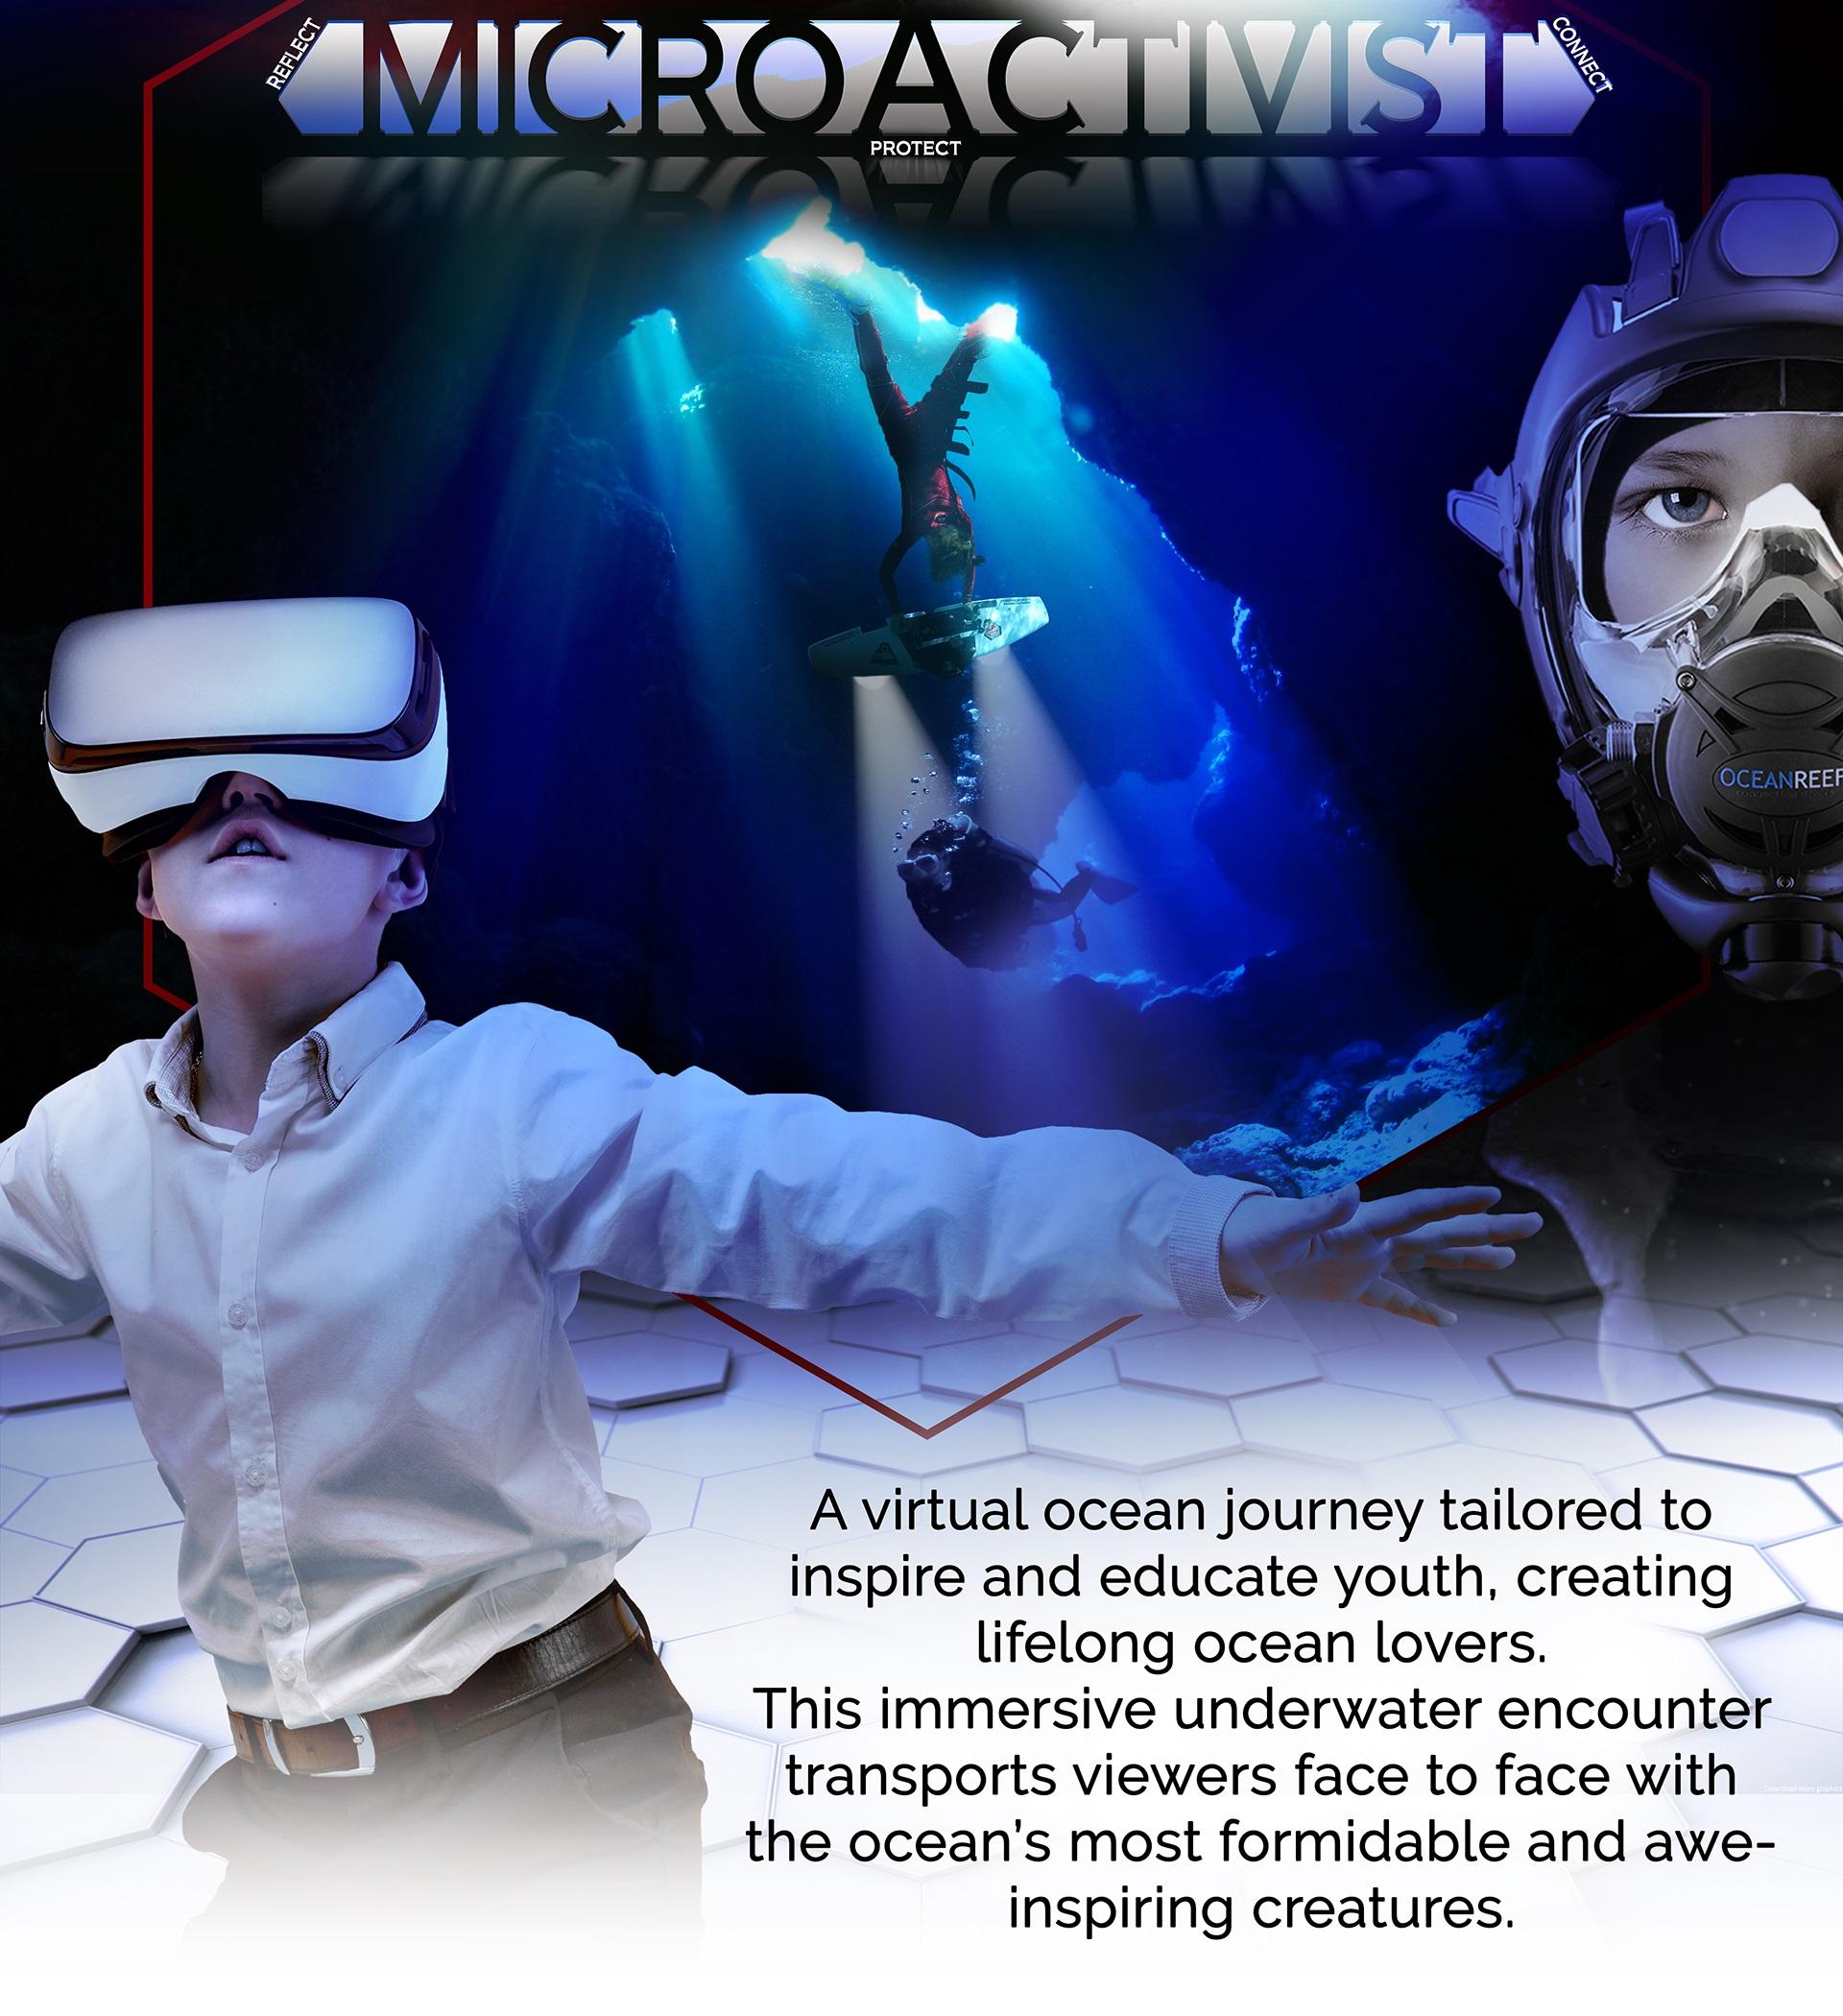 DIVE DEEP - THE ViRtual Ocean EDUCATION OF A LIFETIME